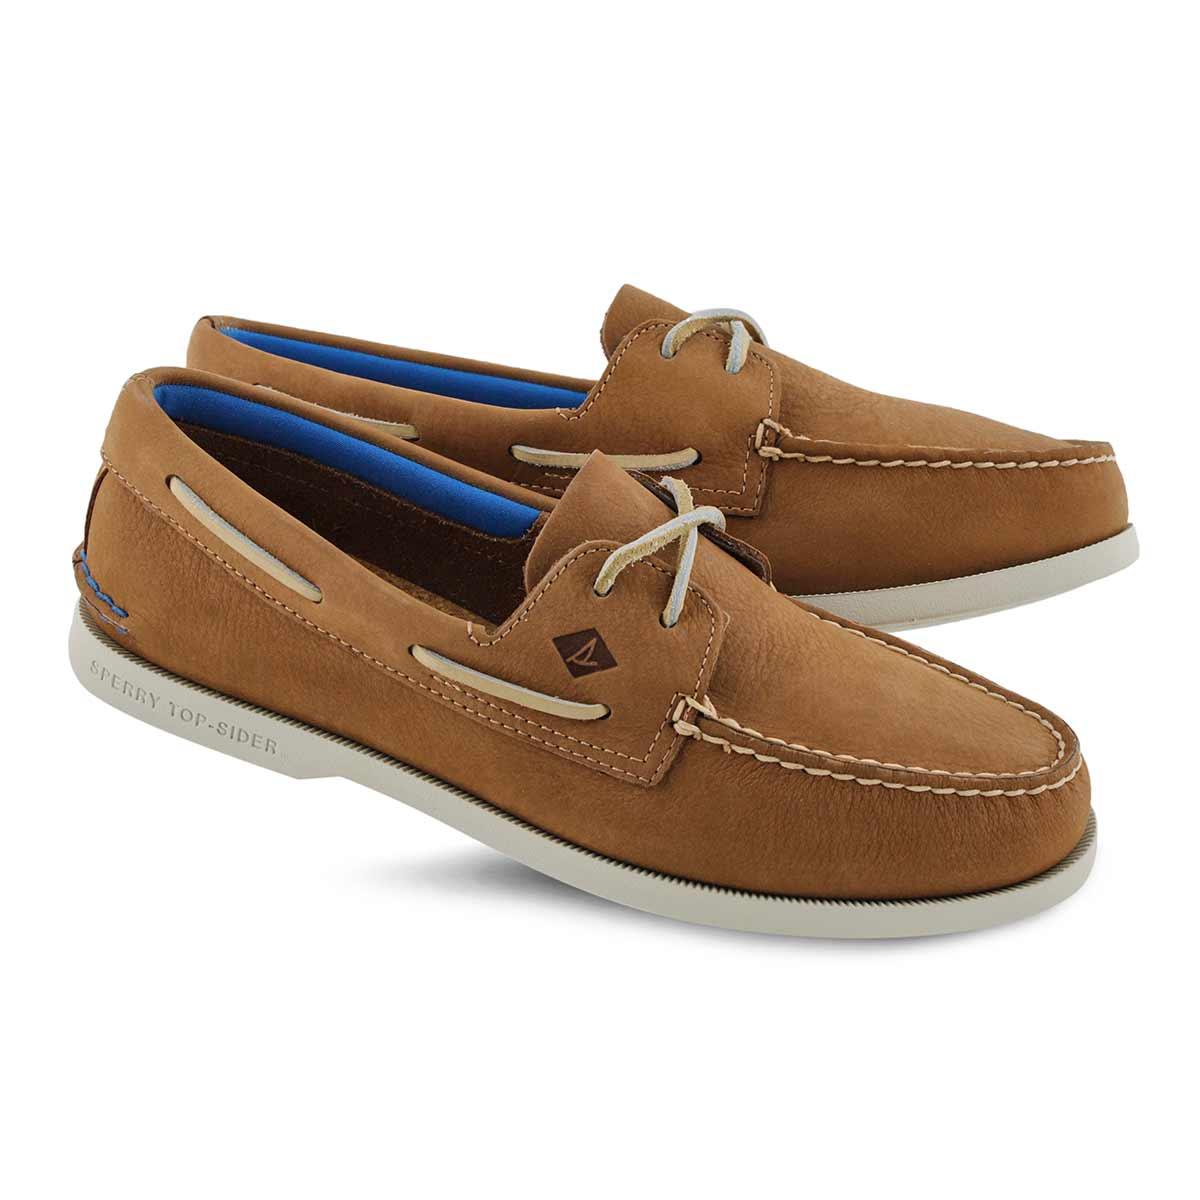 Mns AO 2Eye Plush Washable tan boat shoe